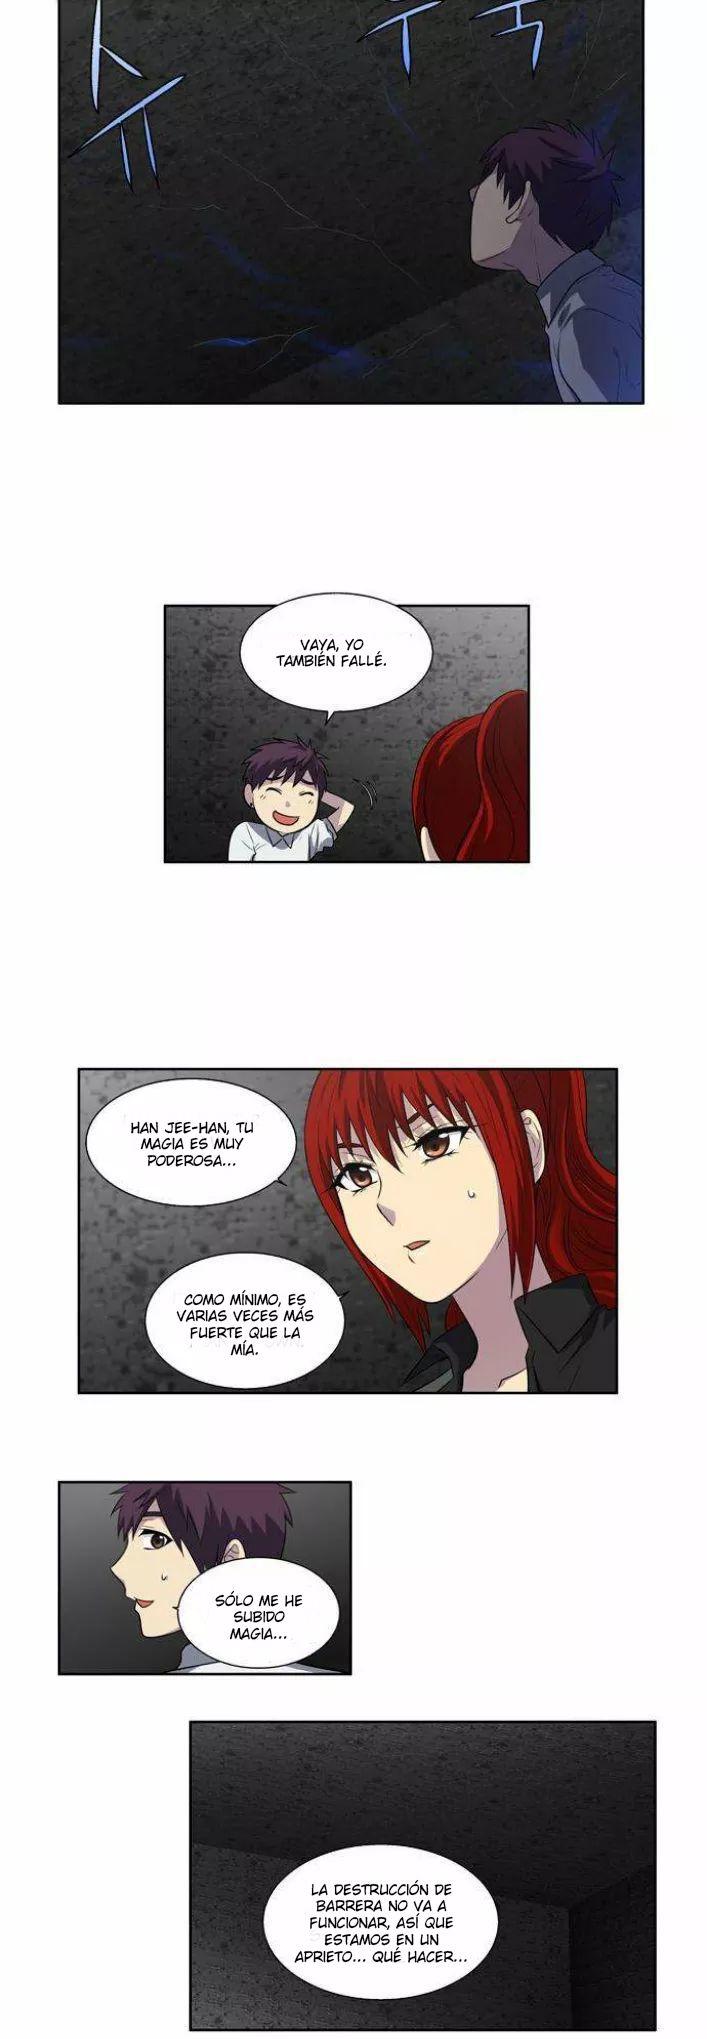 http://c5.ninemanga.com/es_manga/61/1725/484320/df7c8e85edcd0ae014d016d48ab74816.jpg Page 5